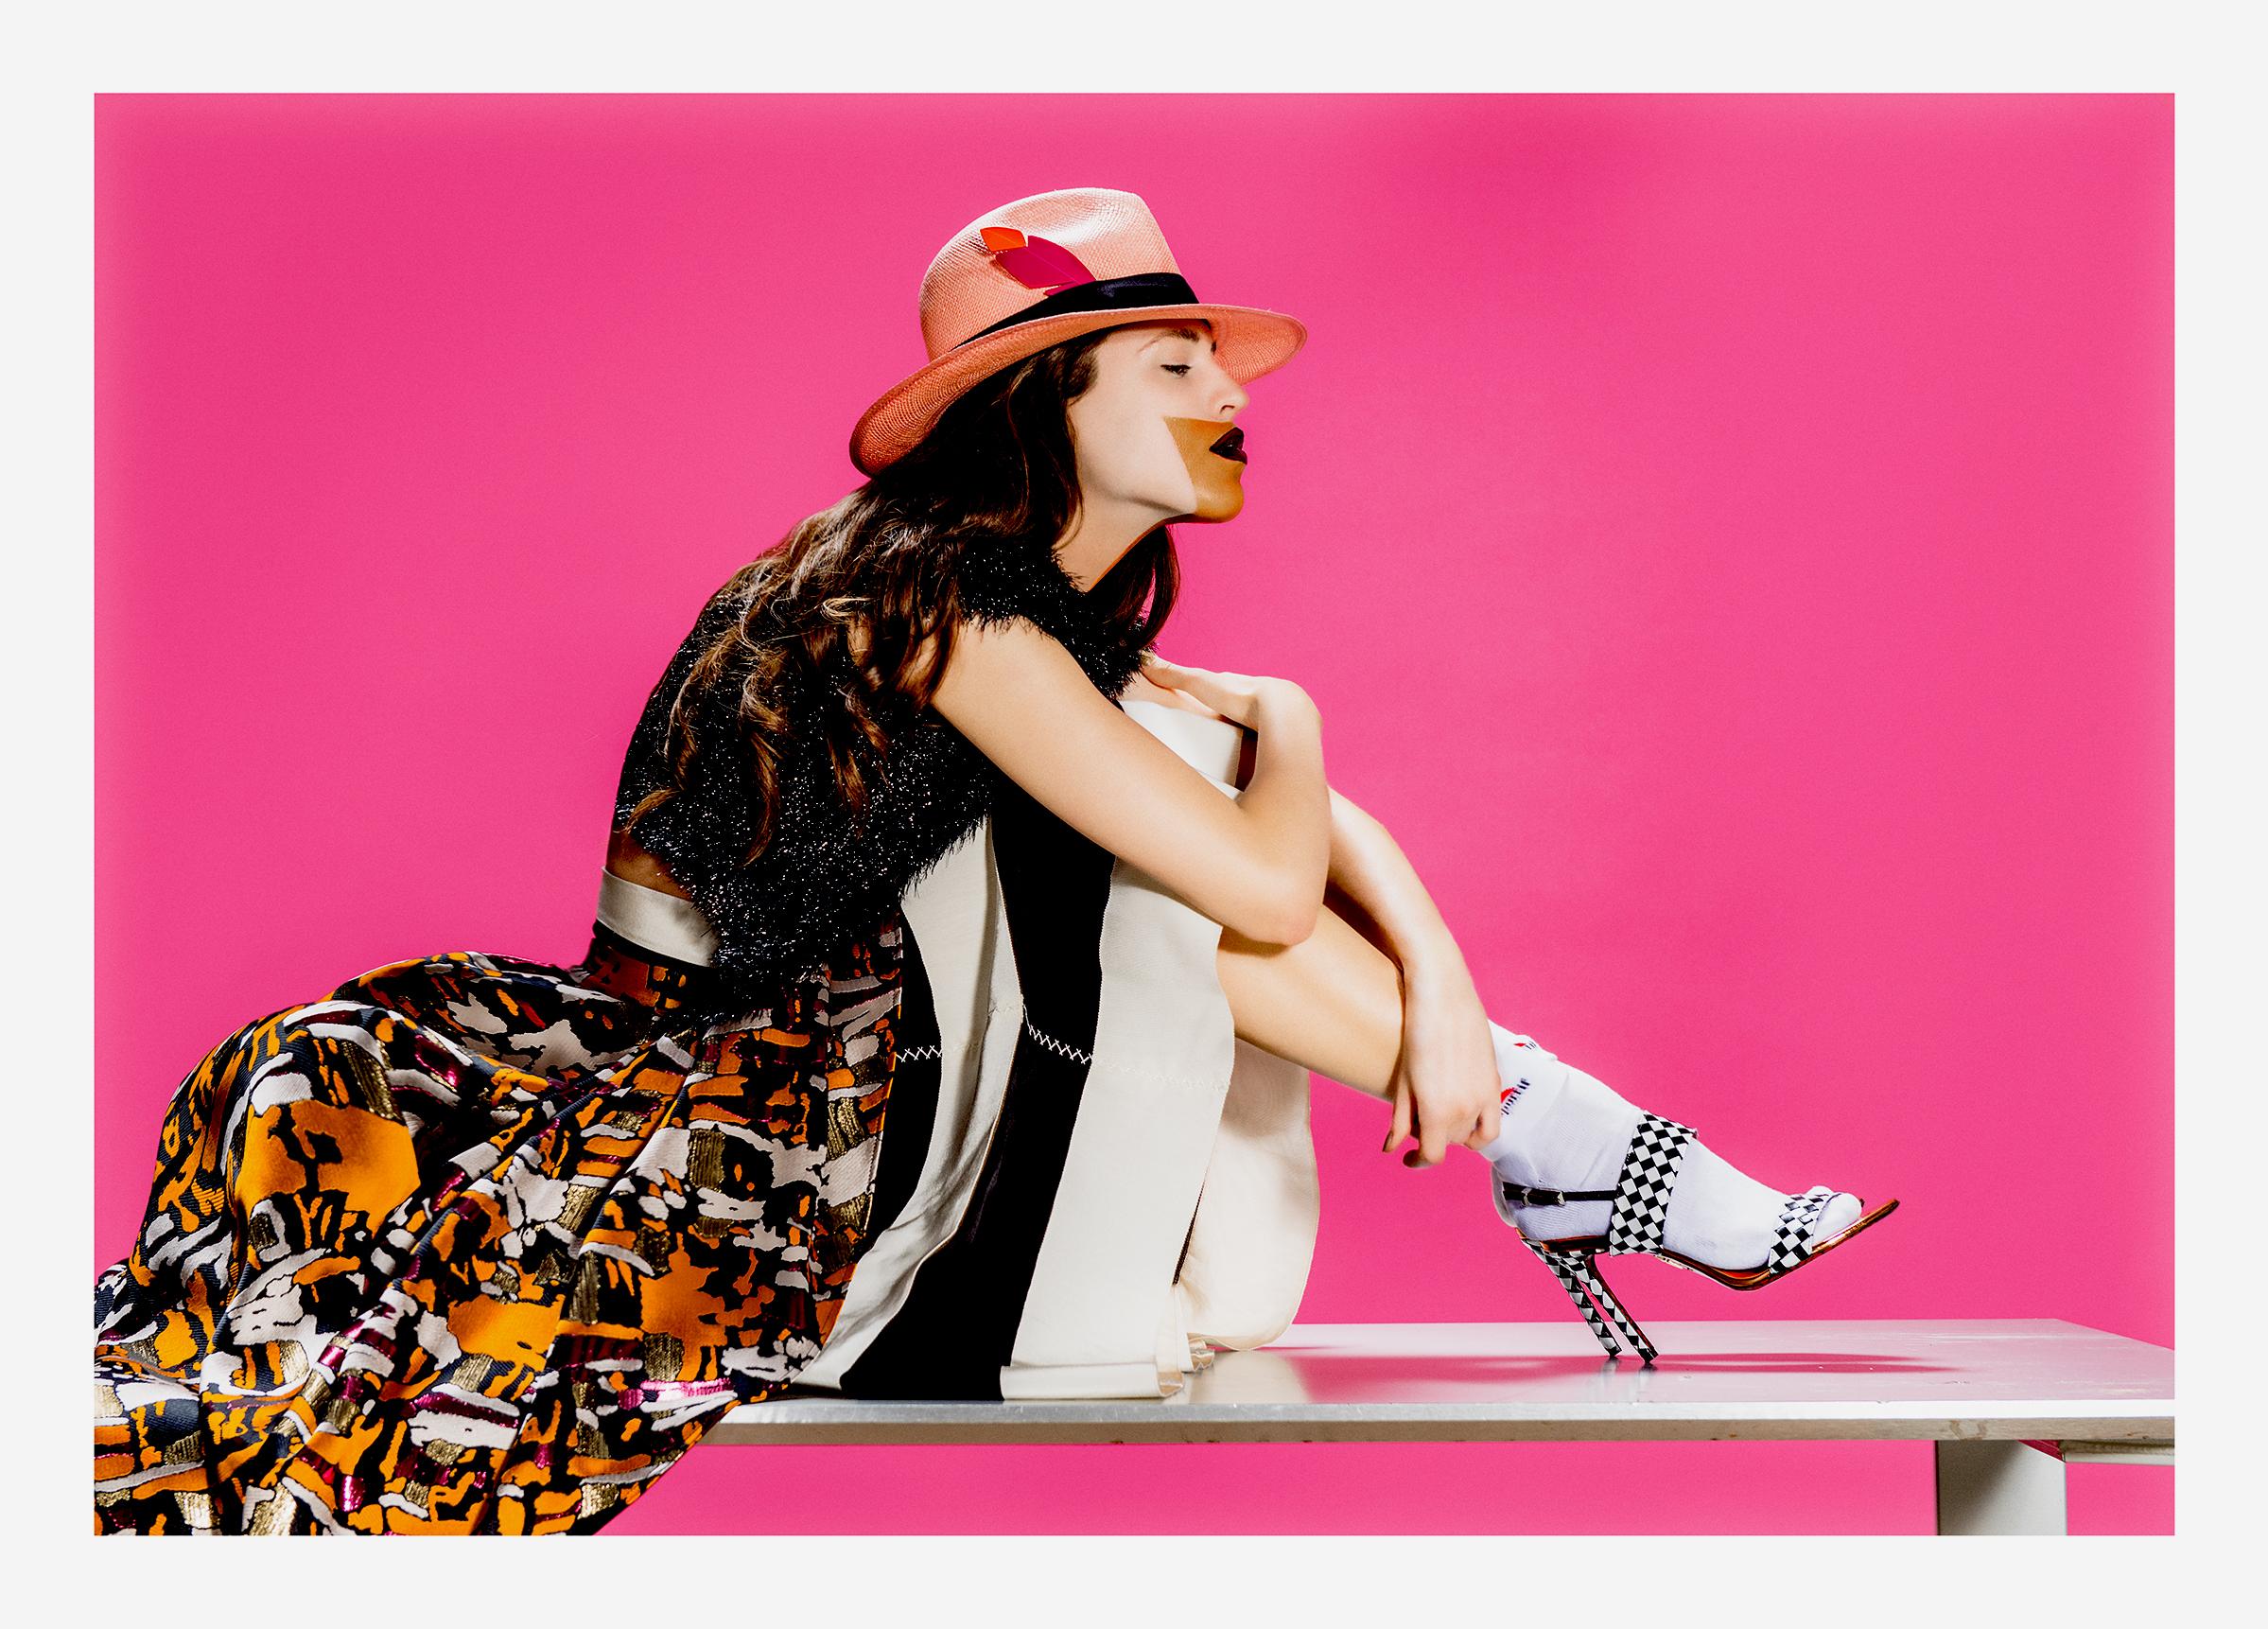 Top - PAULE KA Jupe - PAULE KA et ROSSELLA JARDINI Chaussures - CESARE PACIOTTI Chaussettes - LE COQ SPORTIF Bijoux - PAULE KA Panama - THEPANAMASHOP